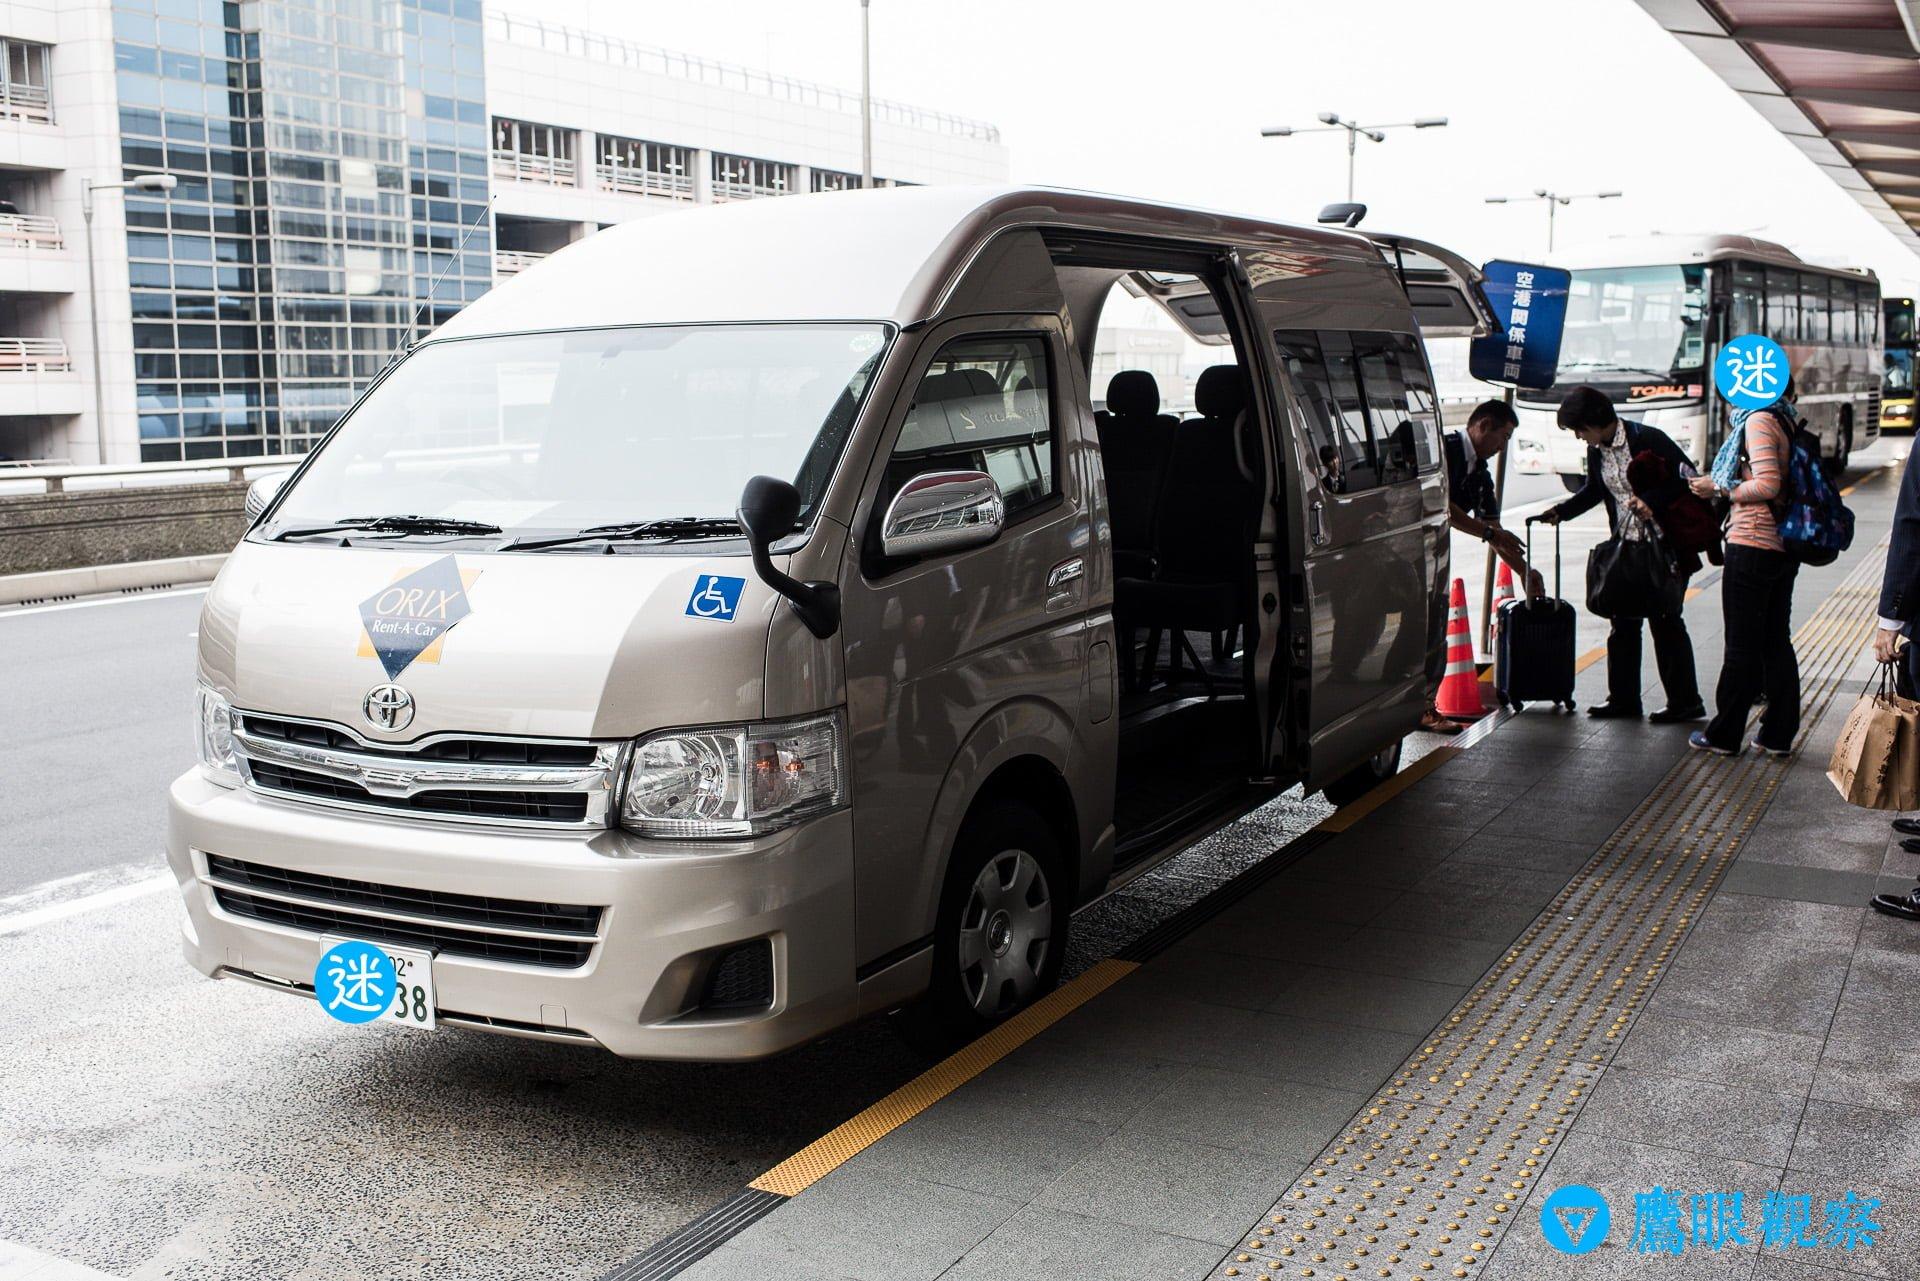 Rental Cars in Airport Tokyo Japan with Orix 4 日本租車:從東京機場自駕暢遊北關東 3 縣的旅遊行程預定、租取還車教學